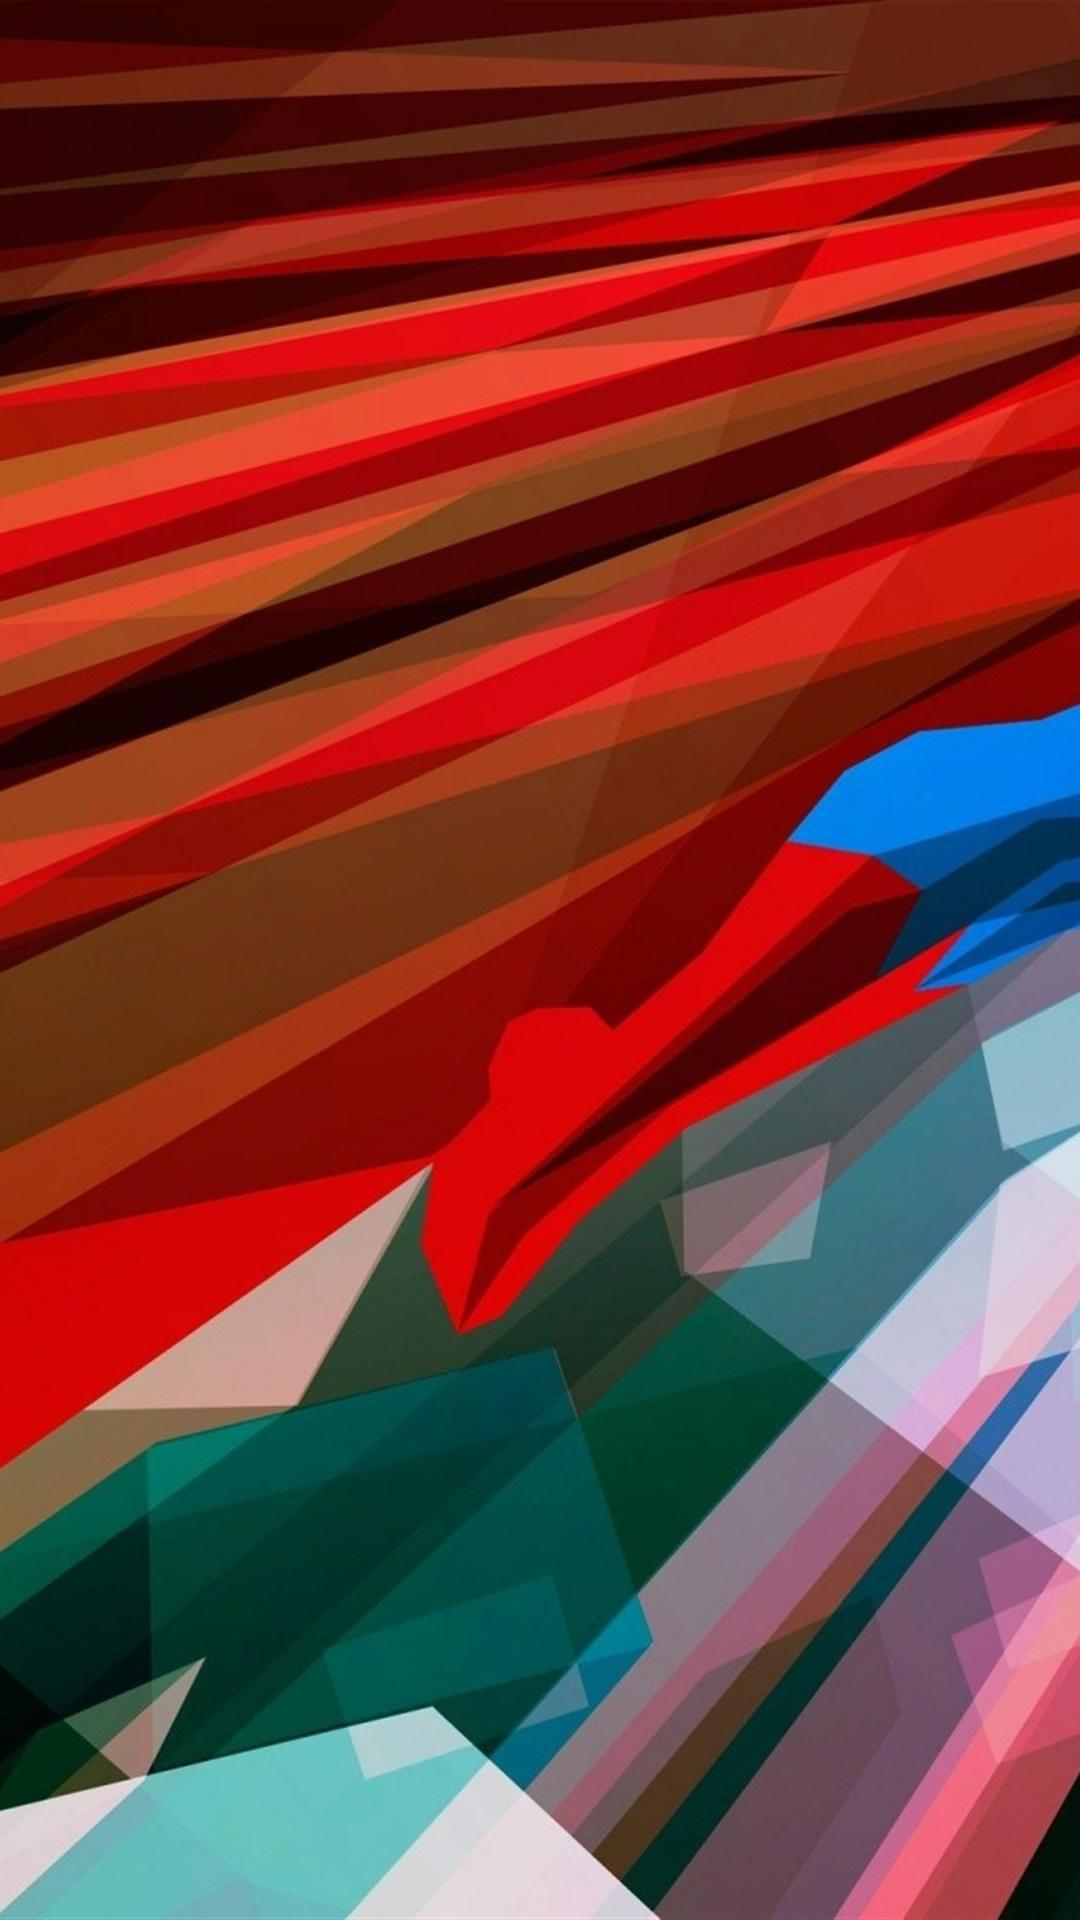 Superhero Hd Wallpapers For Mobile Amazing Superhero